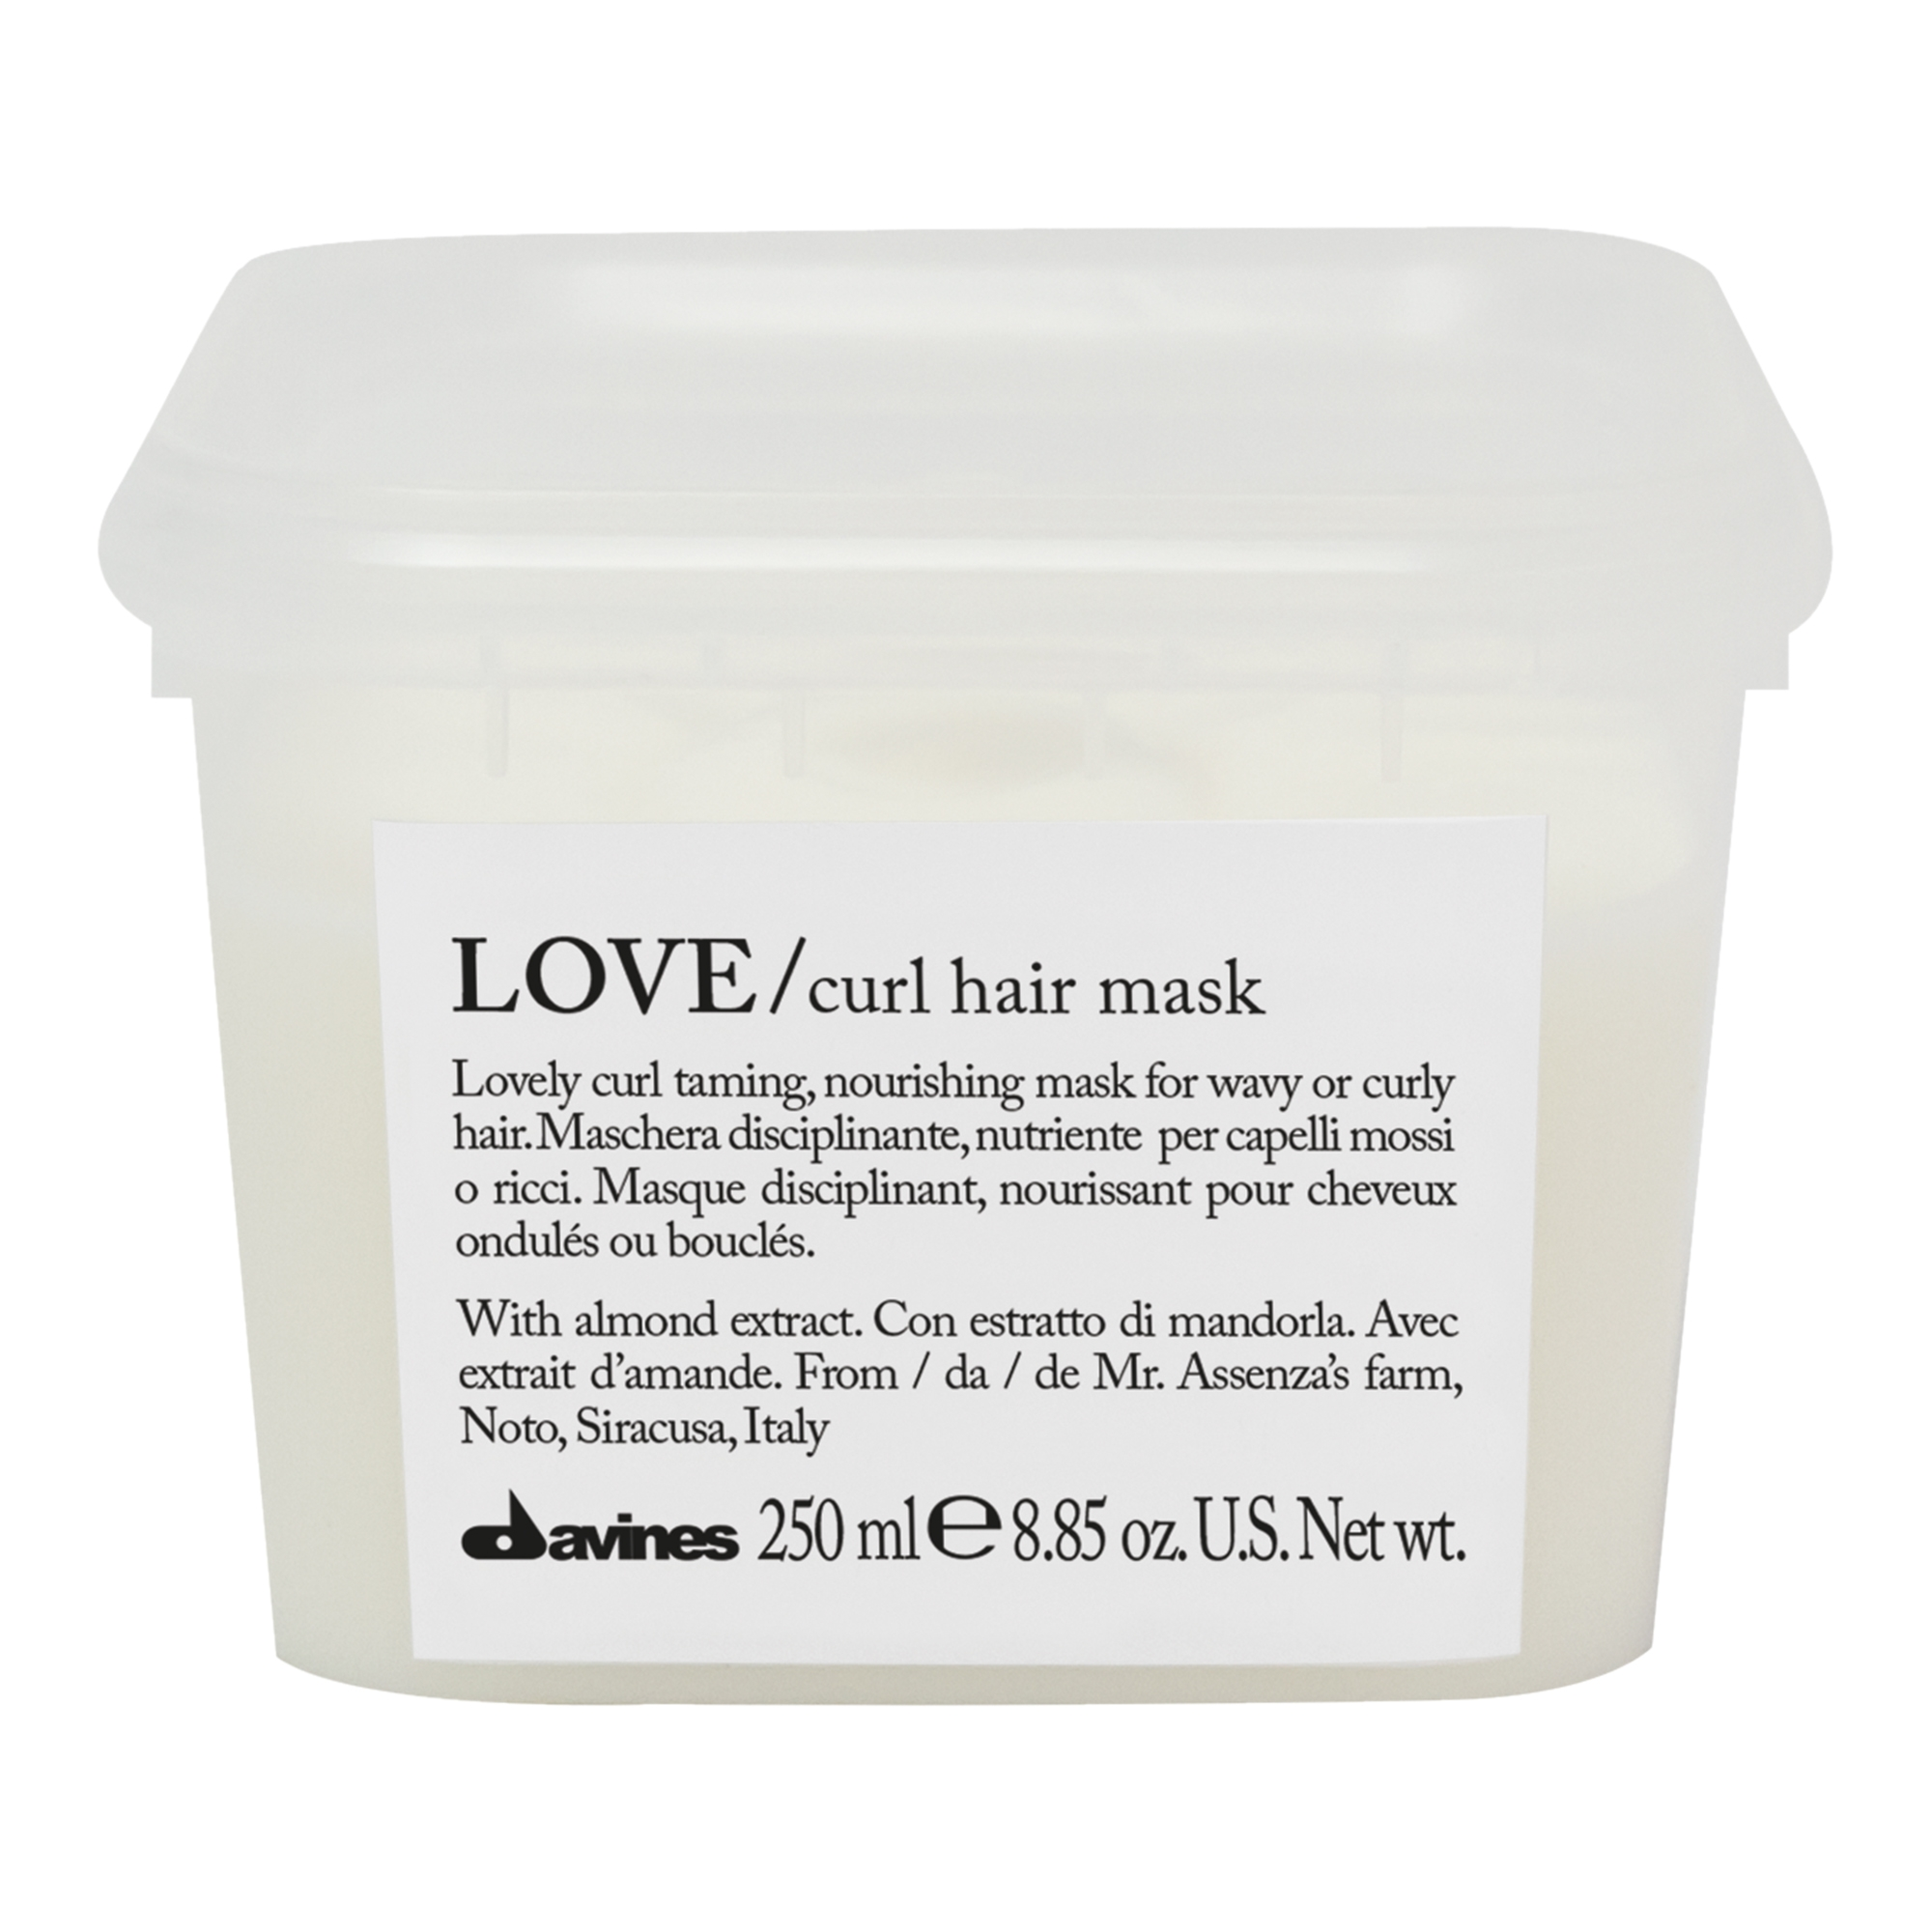 Davines Маска Усиливающая Завиток Love Curl, 250 мл davines контроллер для усиления завитка love curl 150 мл